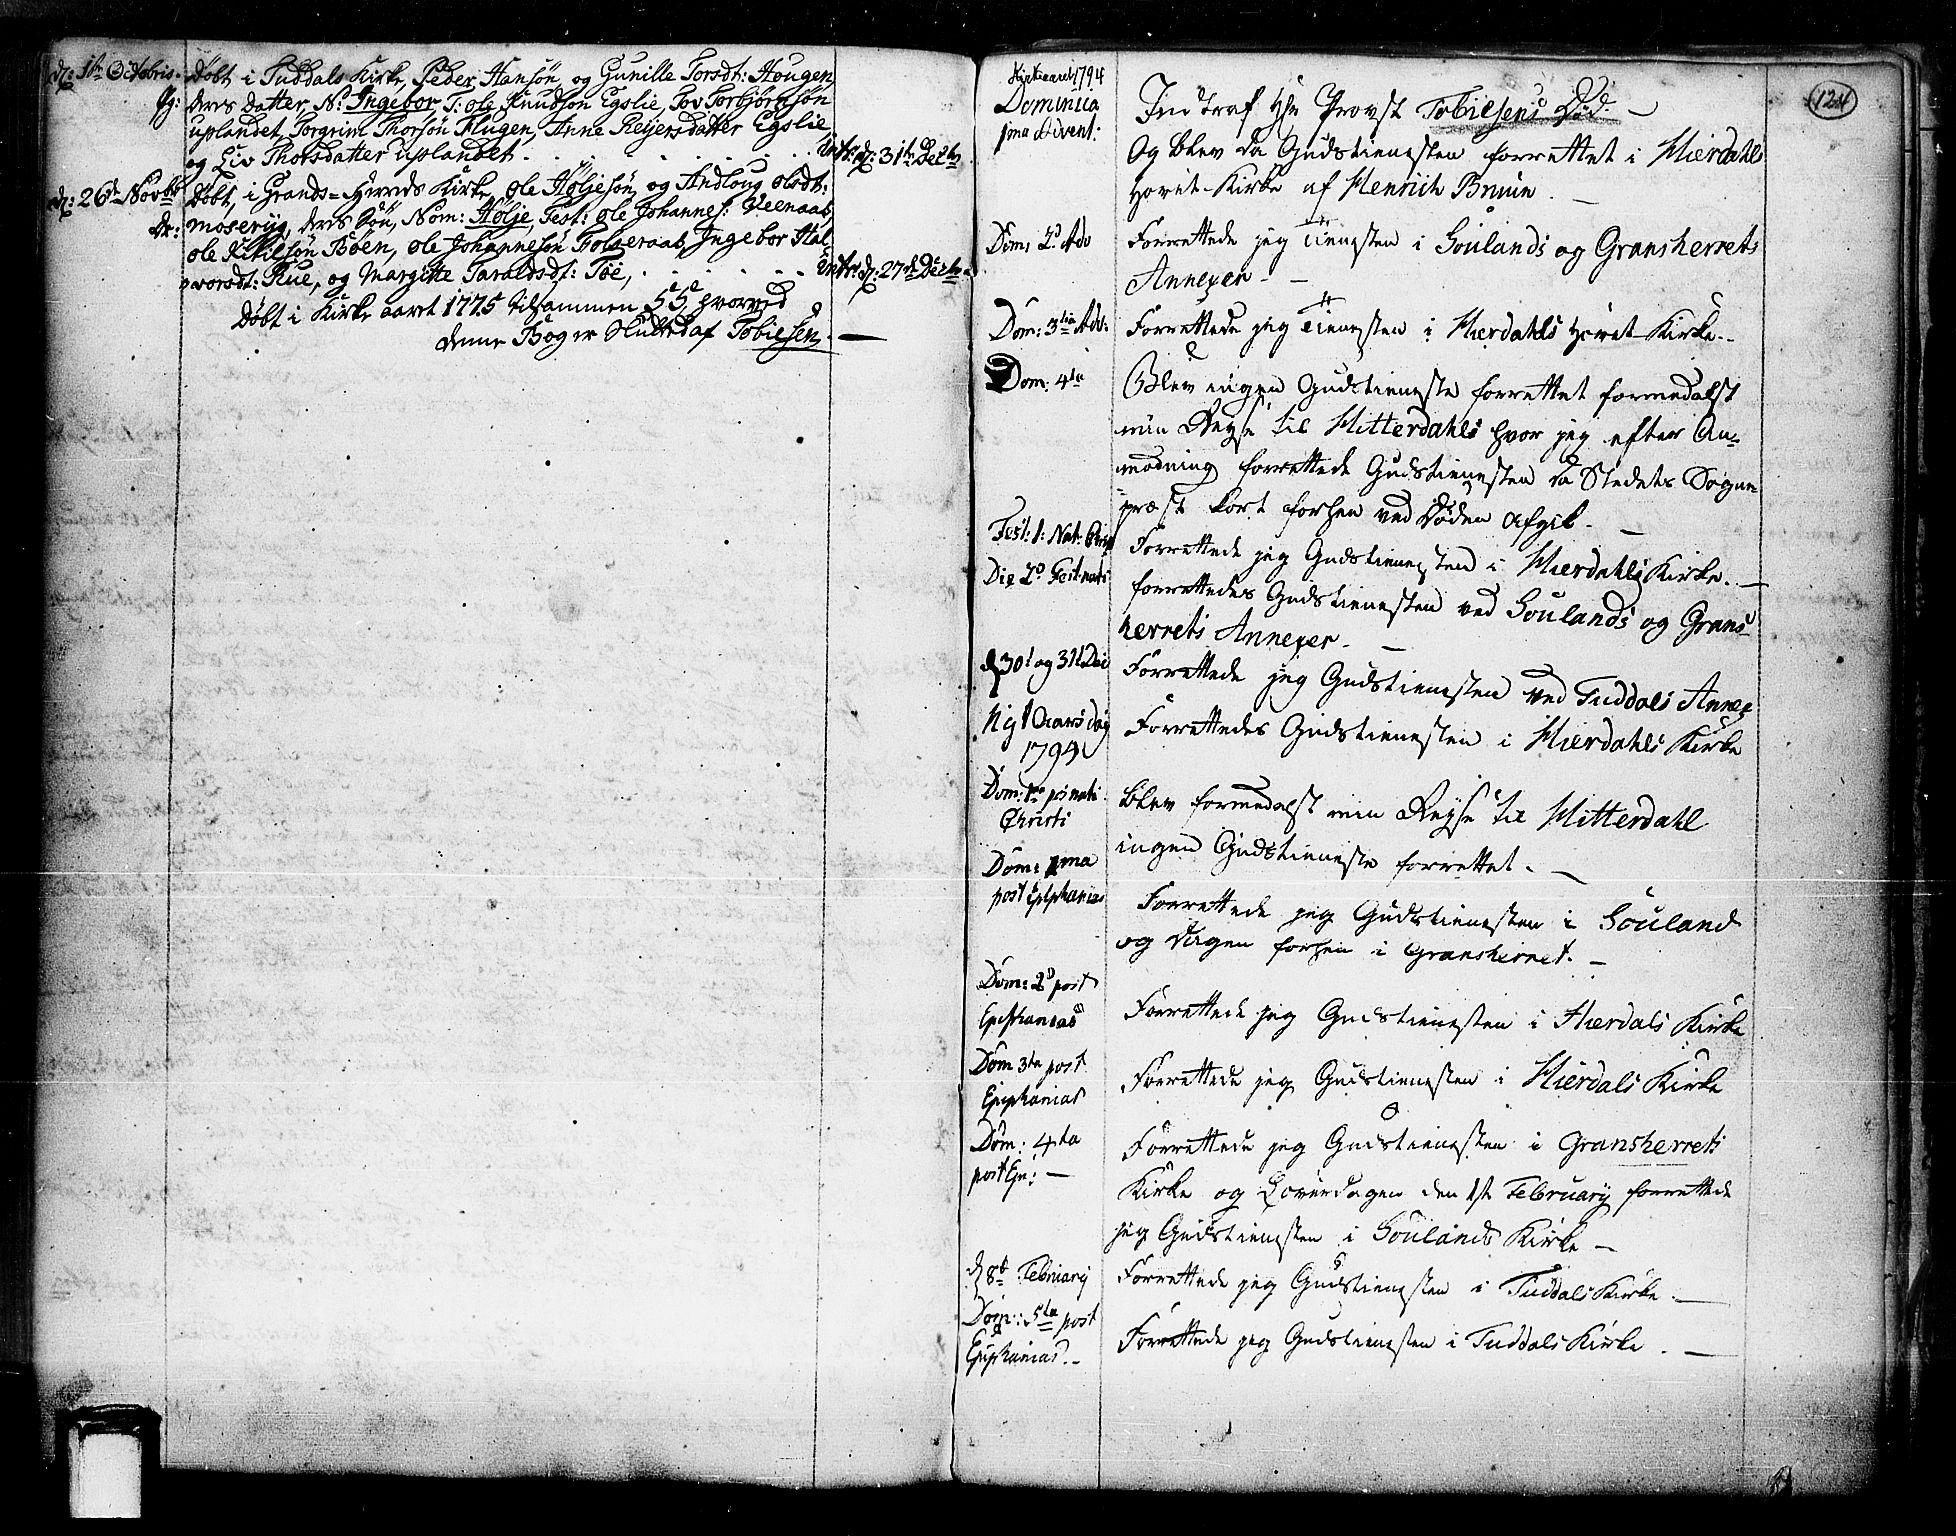 SAKO, Hjartdal kirkebøker, F/Fa/L0003: Ministerialbok nr. I 3, 1727-1775, s. 124